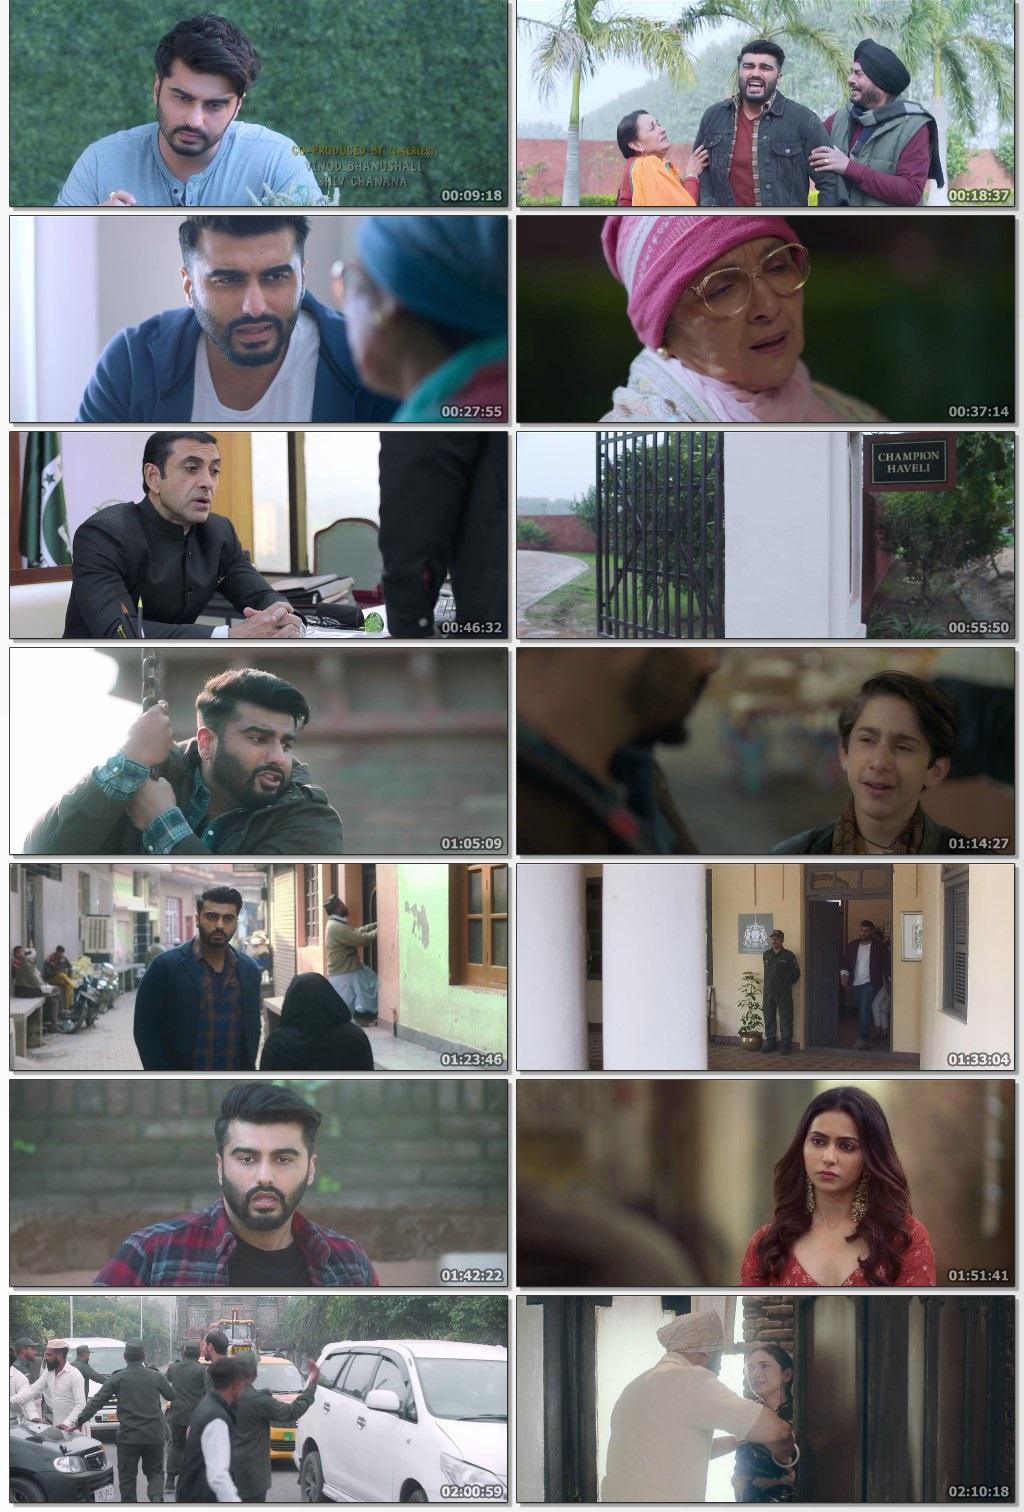 Sardar-Ka-Grandson-2021-www-1kmovies-cyou-Hindi-Movie-720p-NF-HDRip-MSub-1-3-GB-mkv-thumbs